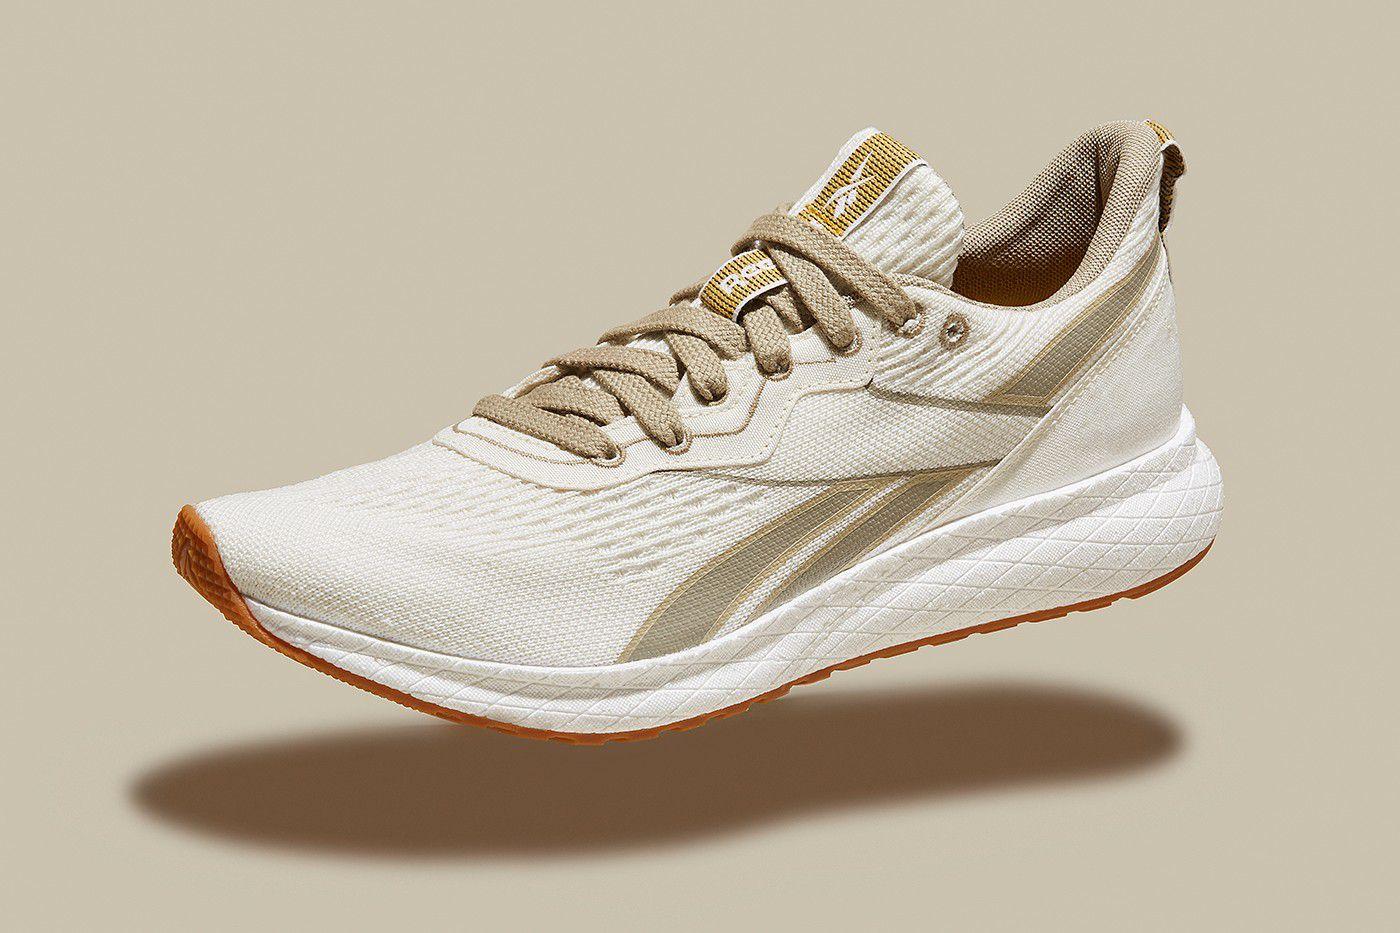 Reebok je lansirao svoje prve ekološki održive tenisice za trčanje